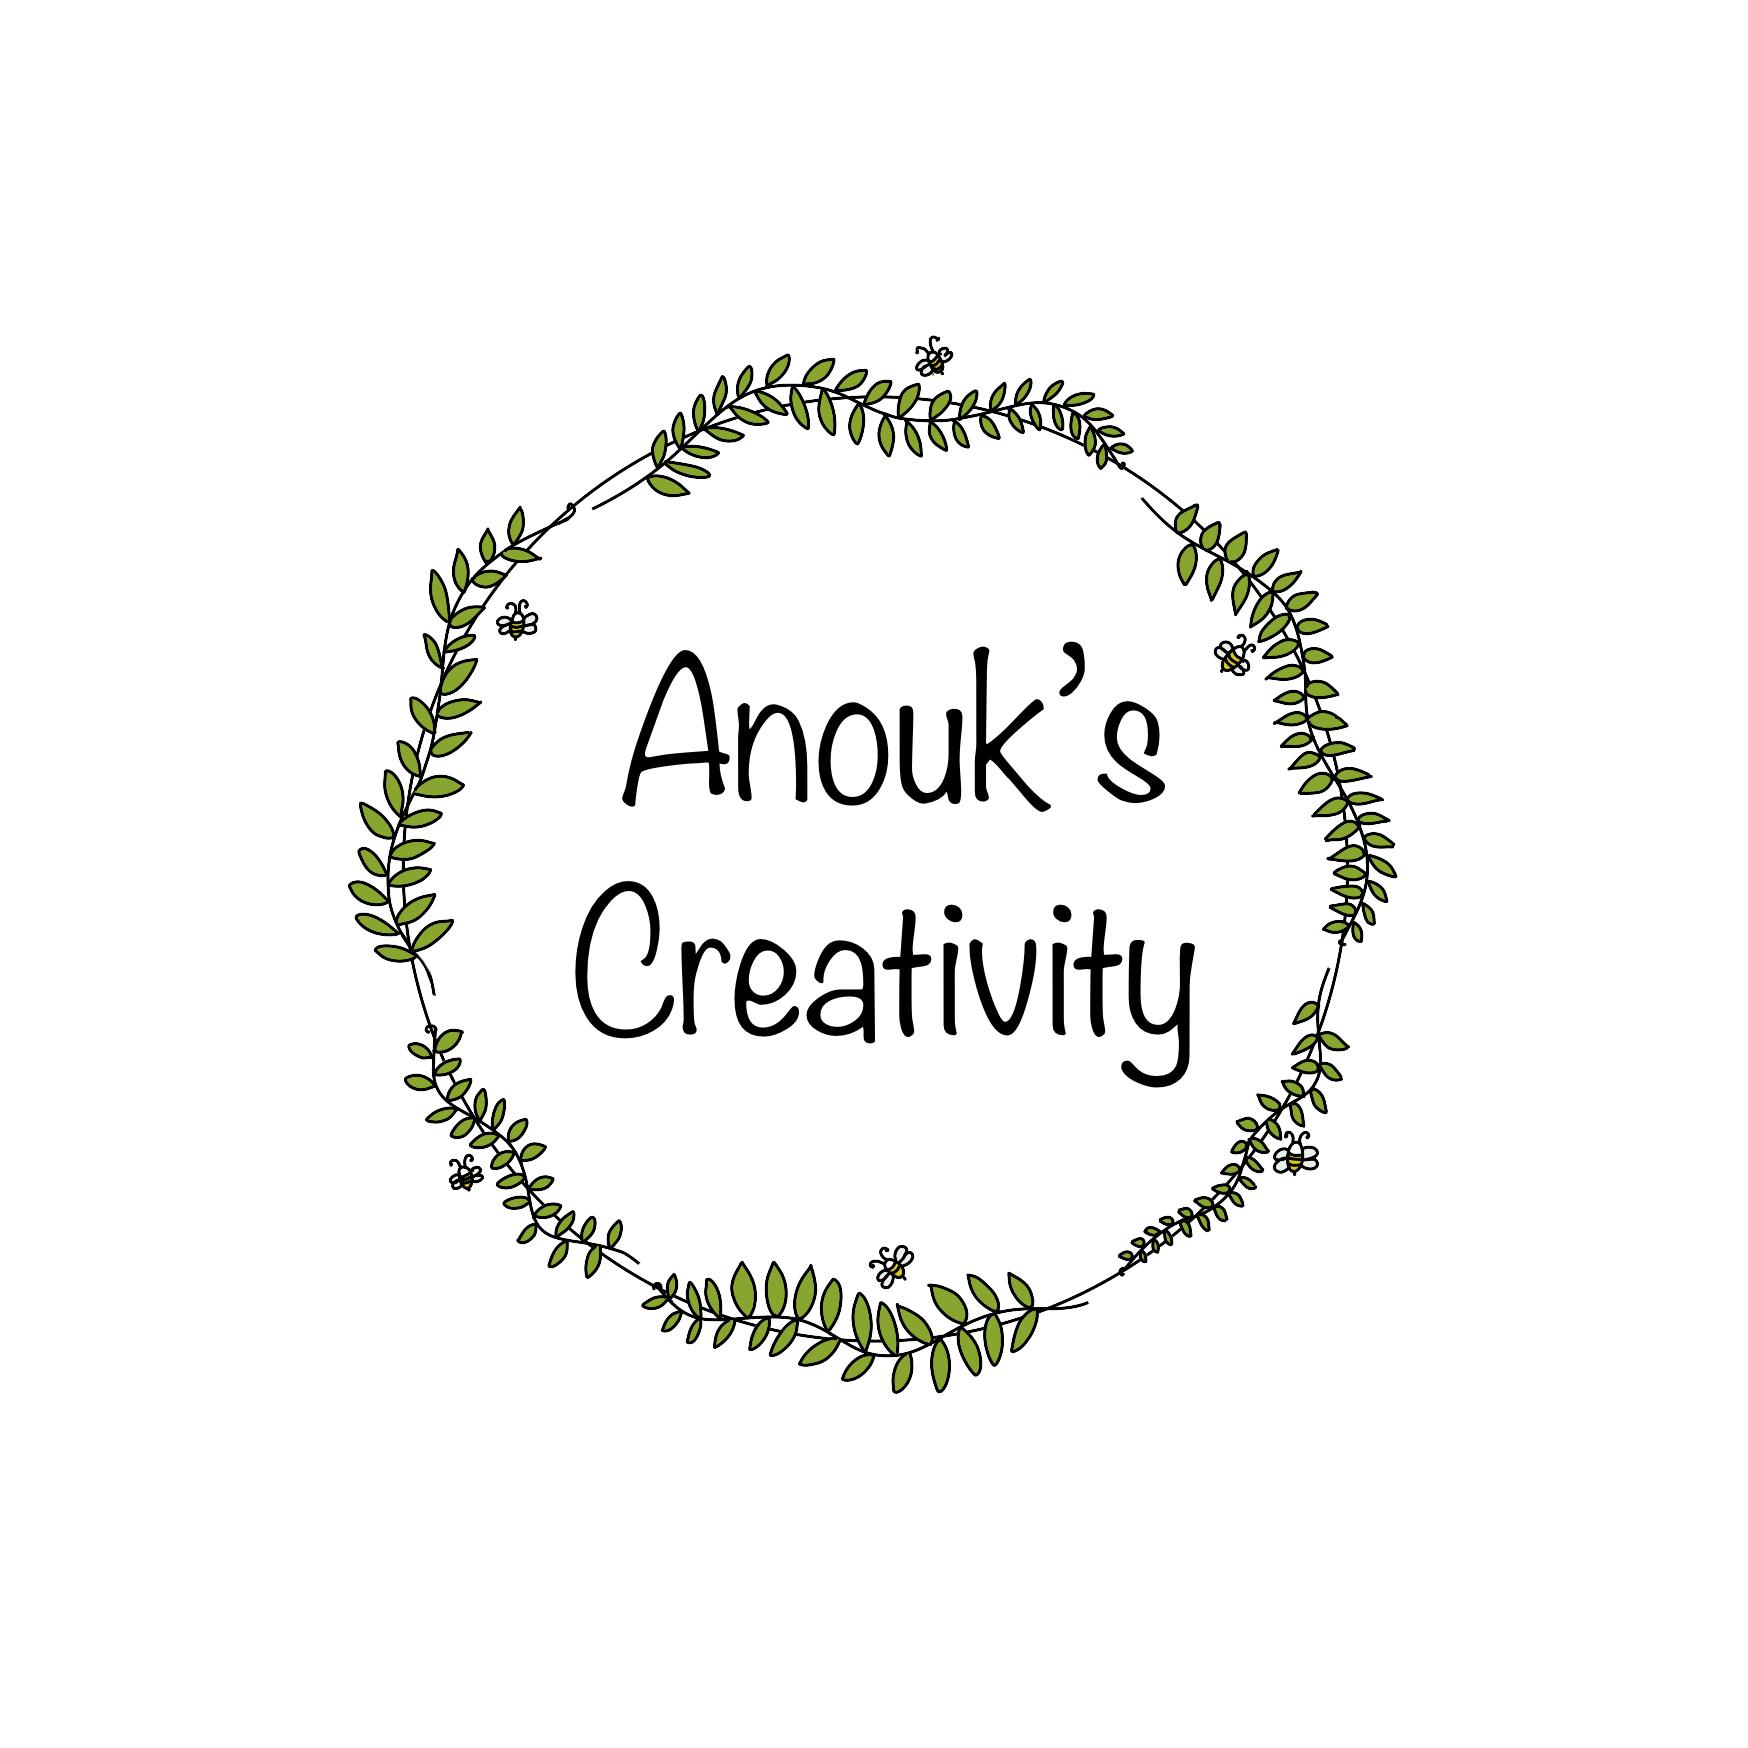 Anouk's Creativity